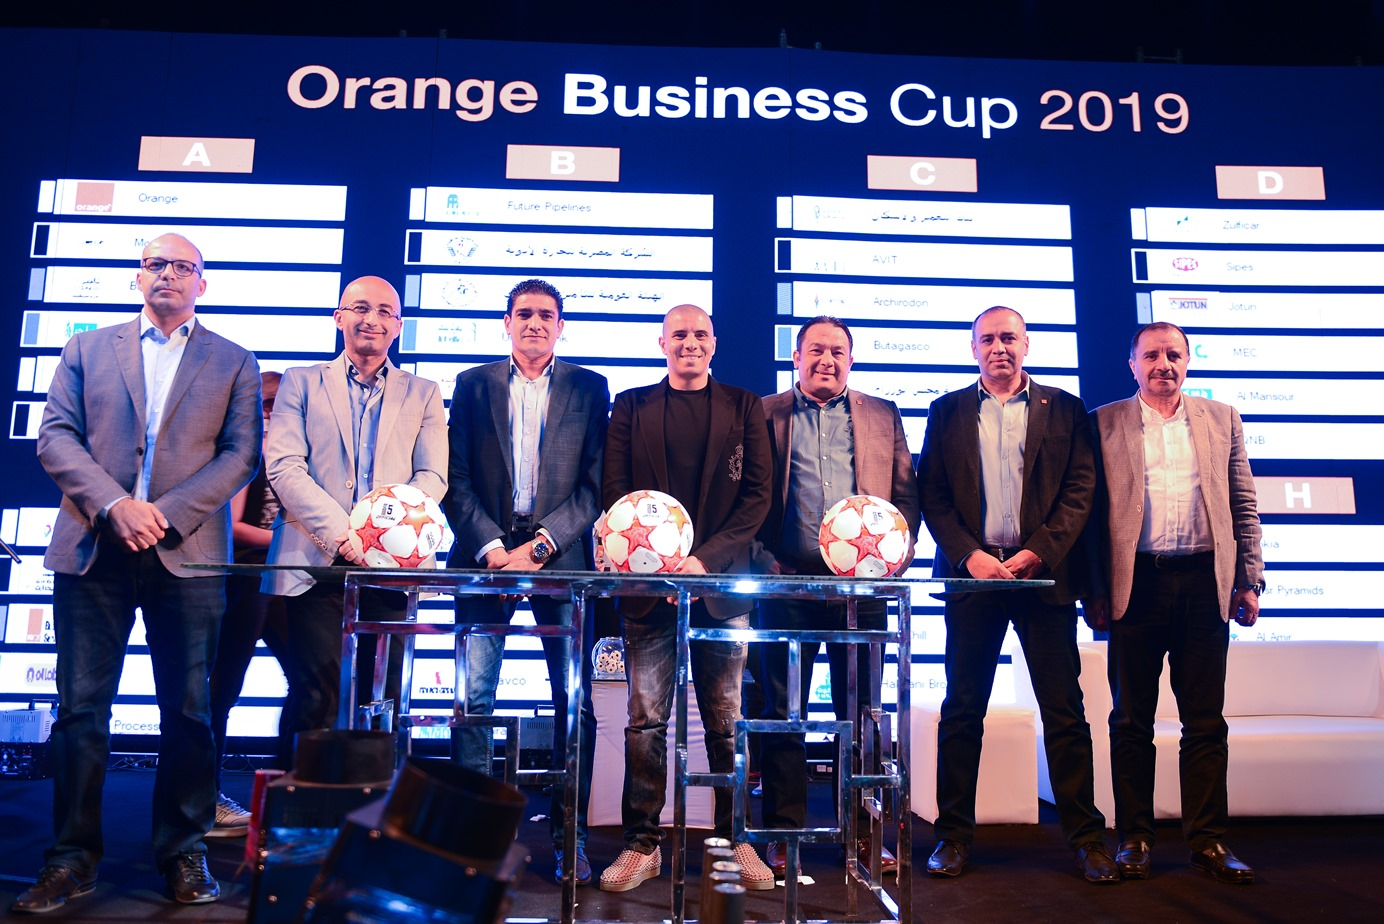 Orange Business Cup 2019